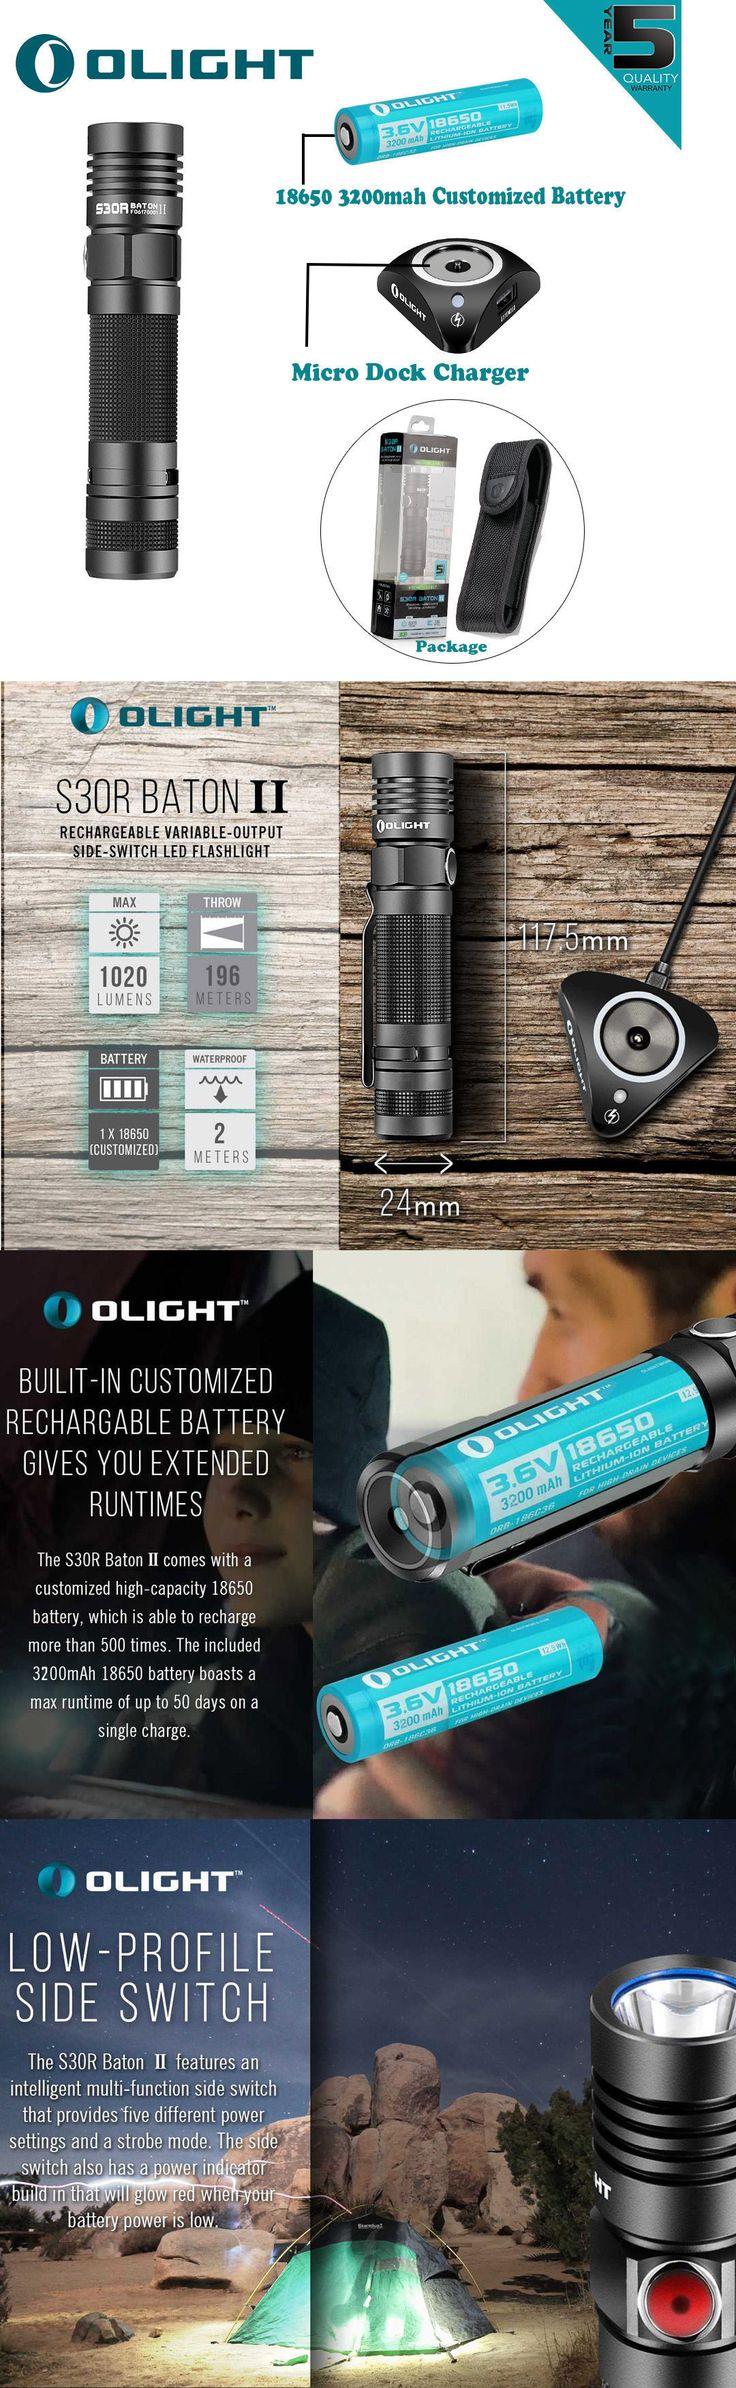 Flashlights 16037: Olight S30r Ii Baton 3200Mah 1020Lm Rechargeable Led Flashlight W 18650 Battery -> BUY IT NOW ONLY: $67.95 on eBay!